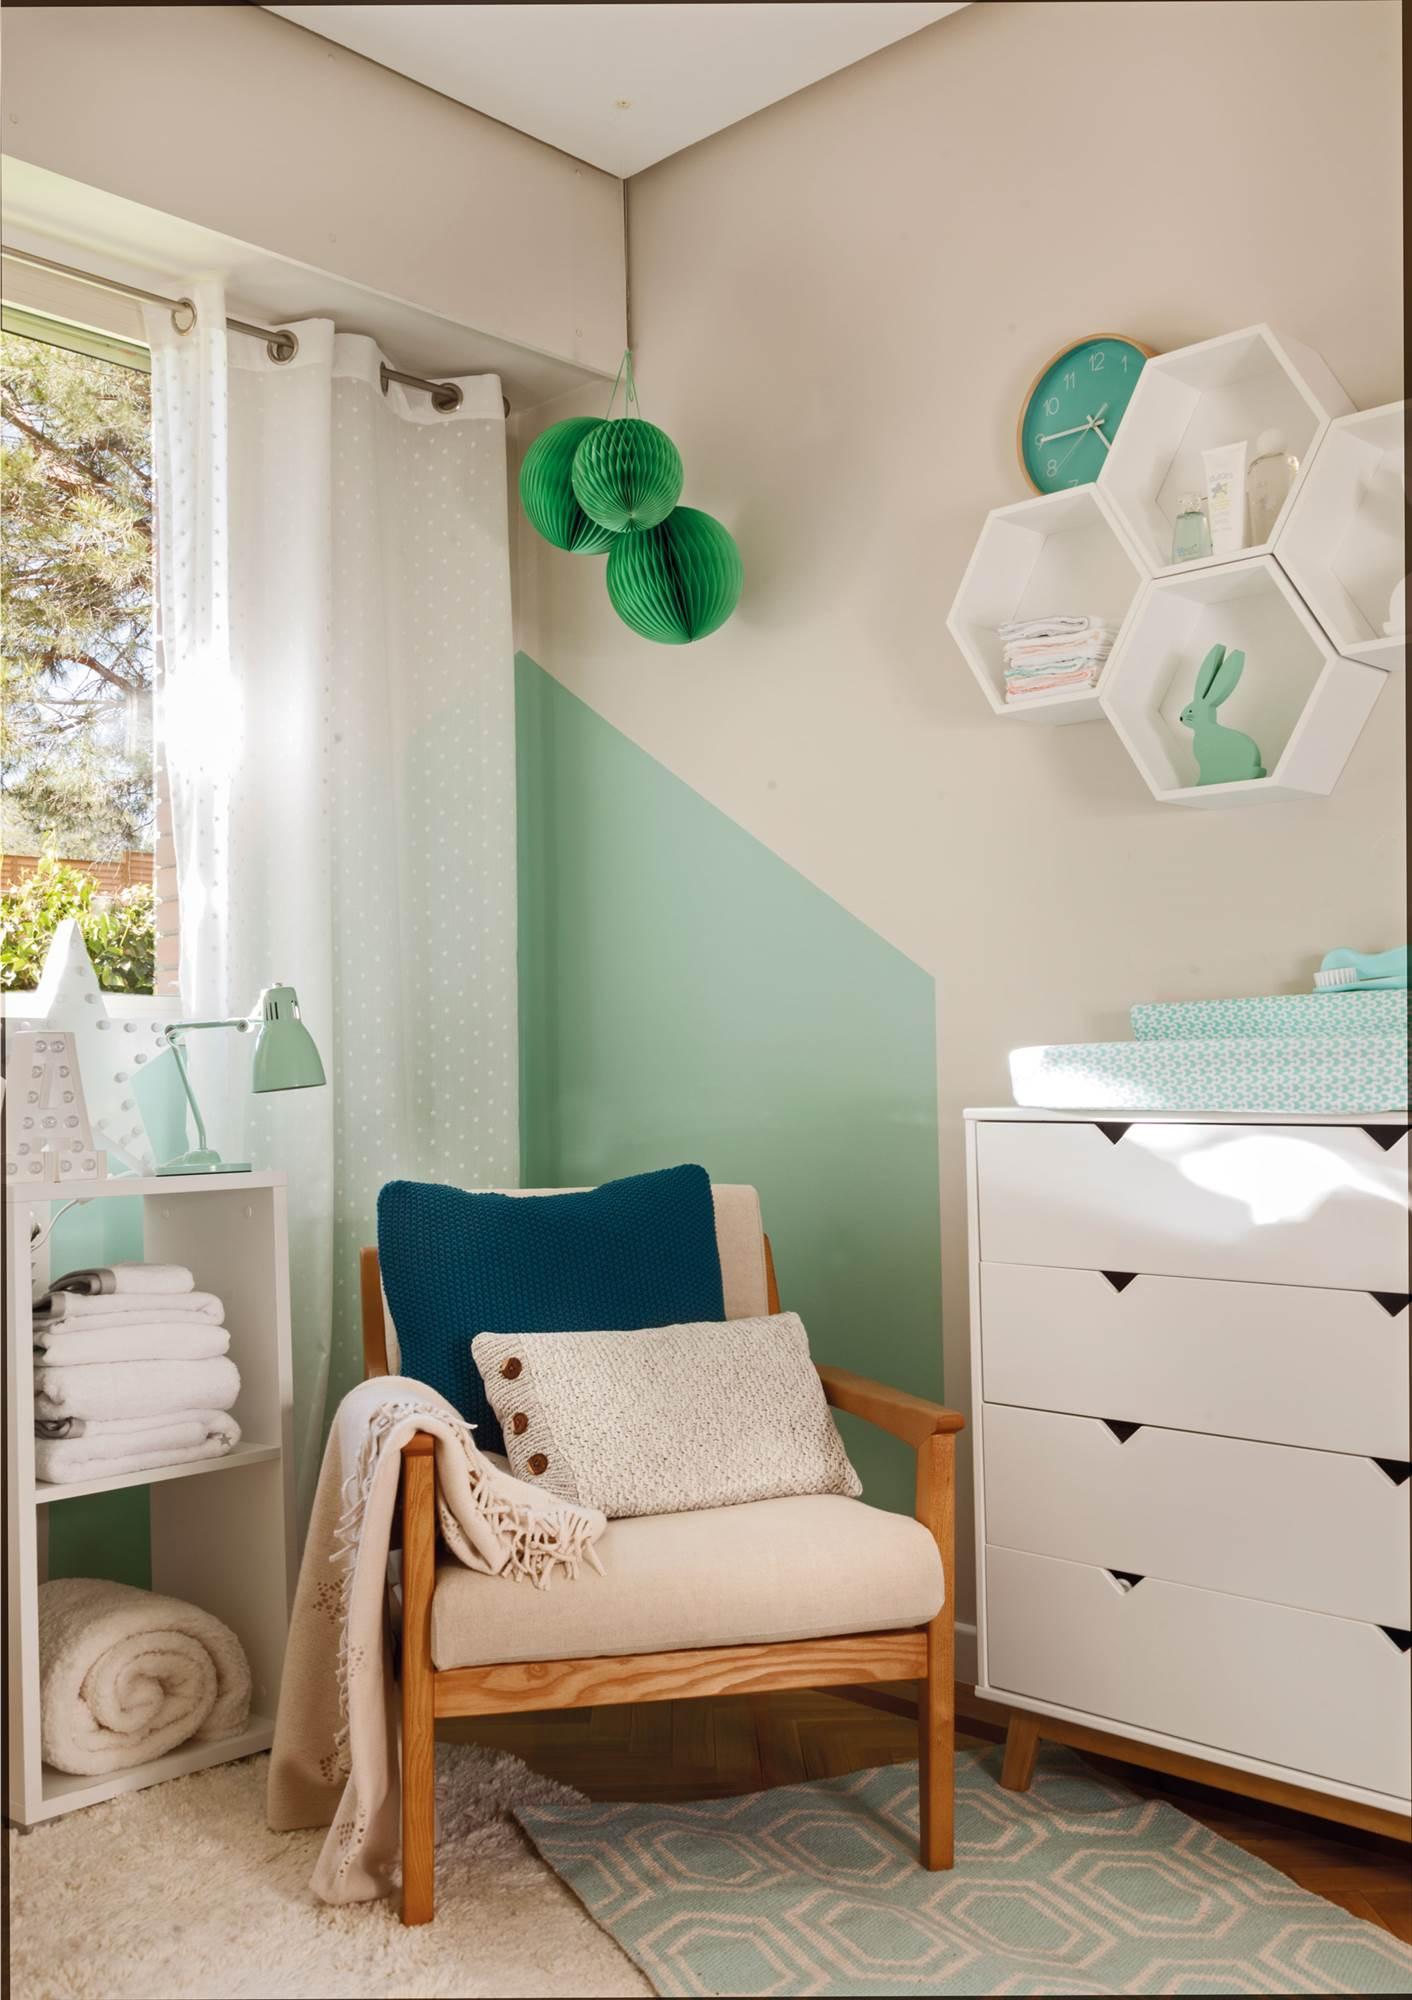 Pintar dormitorio infantil - Ideas pintar habitacion infantil ...